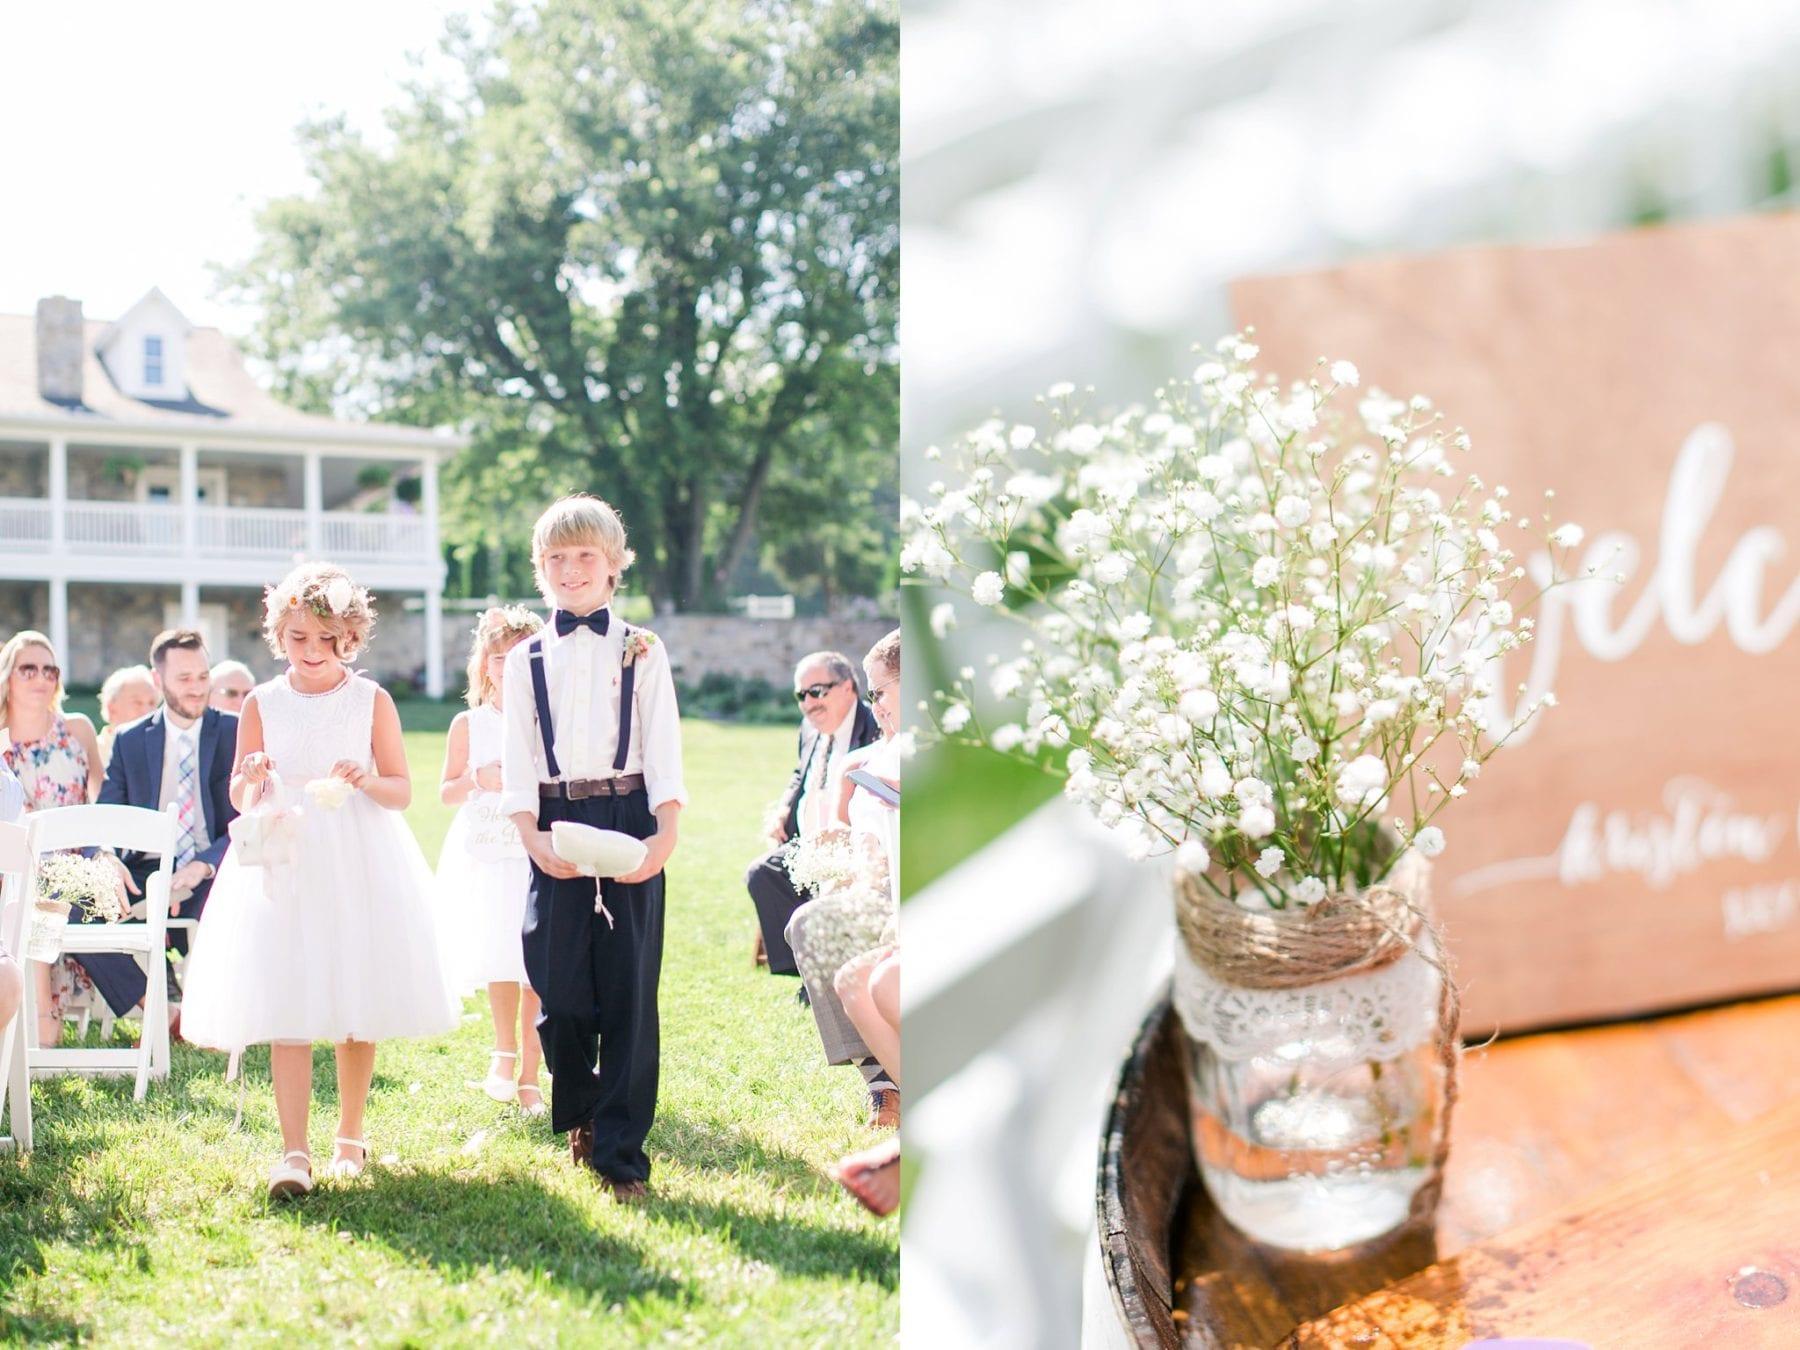 Pond View Farm Wedding Photos Maryland Wedding Photographer Kristen & Ryan Megan Kelsey Photography Blog-113.jpg